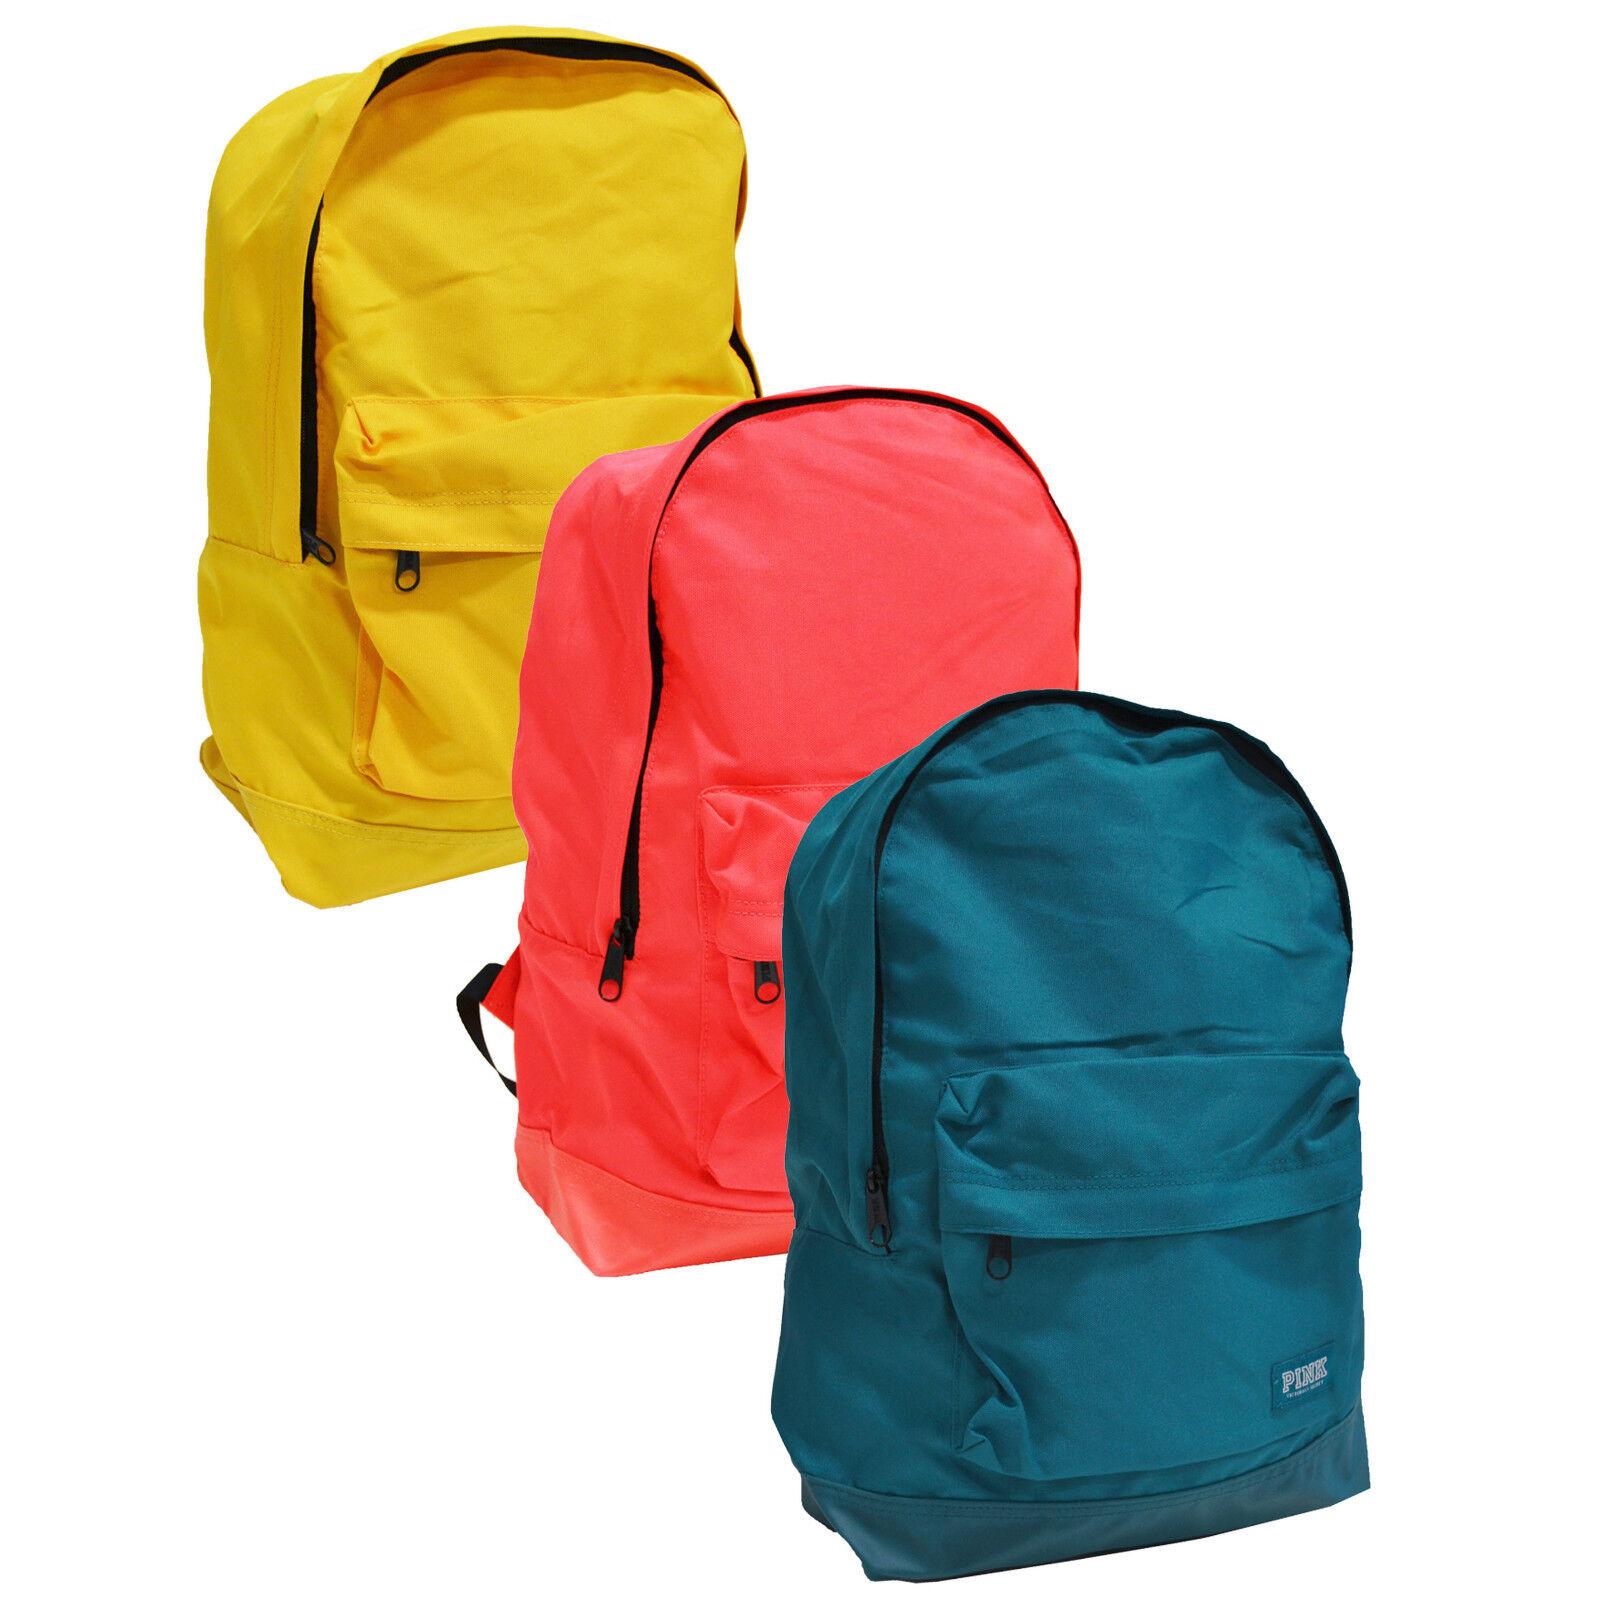 Victoria's Secret Pink Backpack School Book Bag Adjustable S